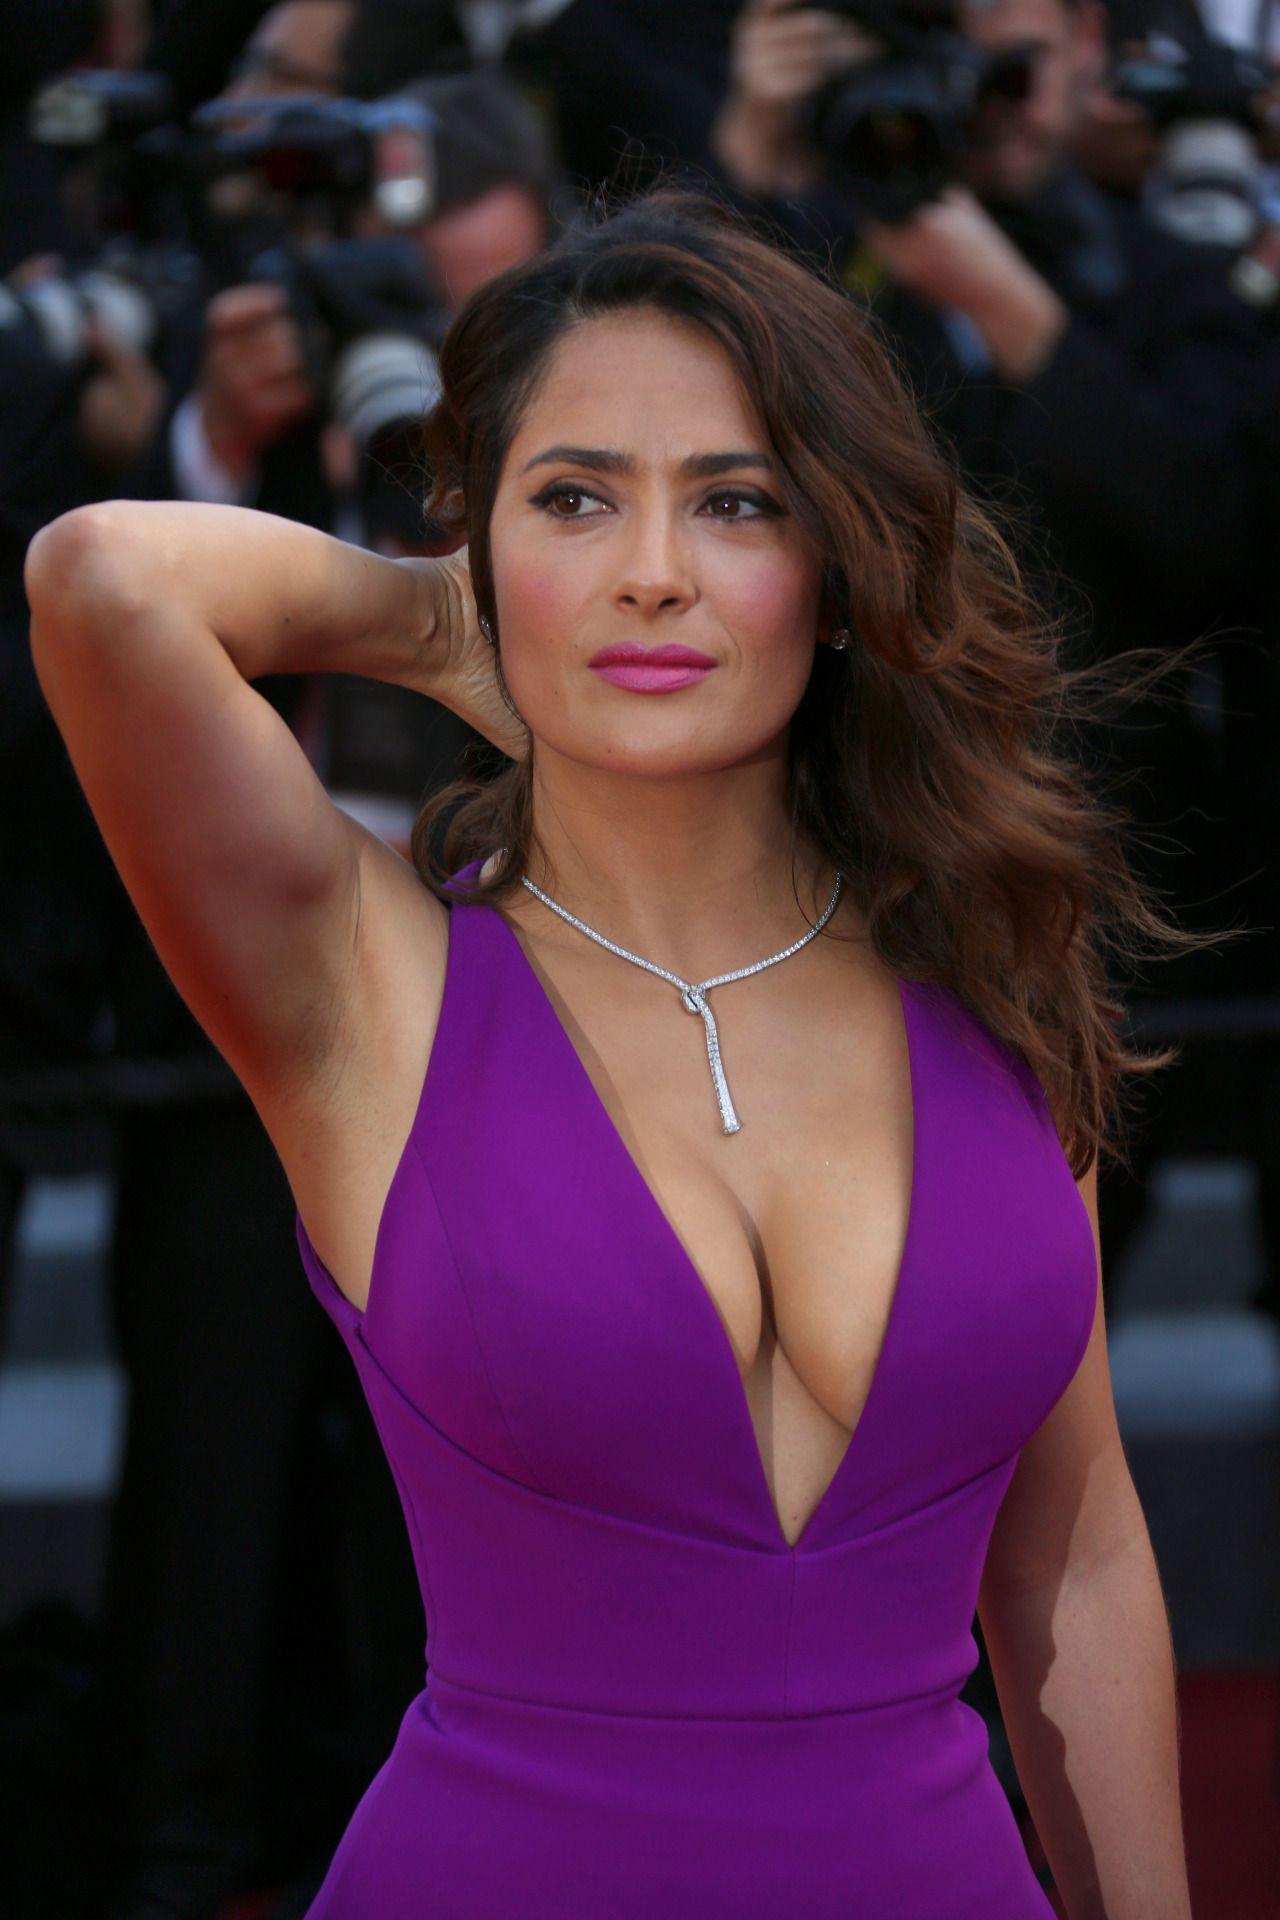 braless Celebrity Salma Hayek naked photo 2017